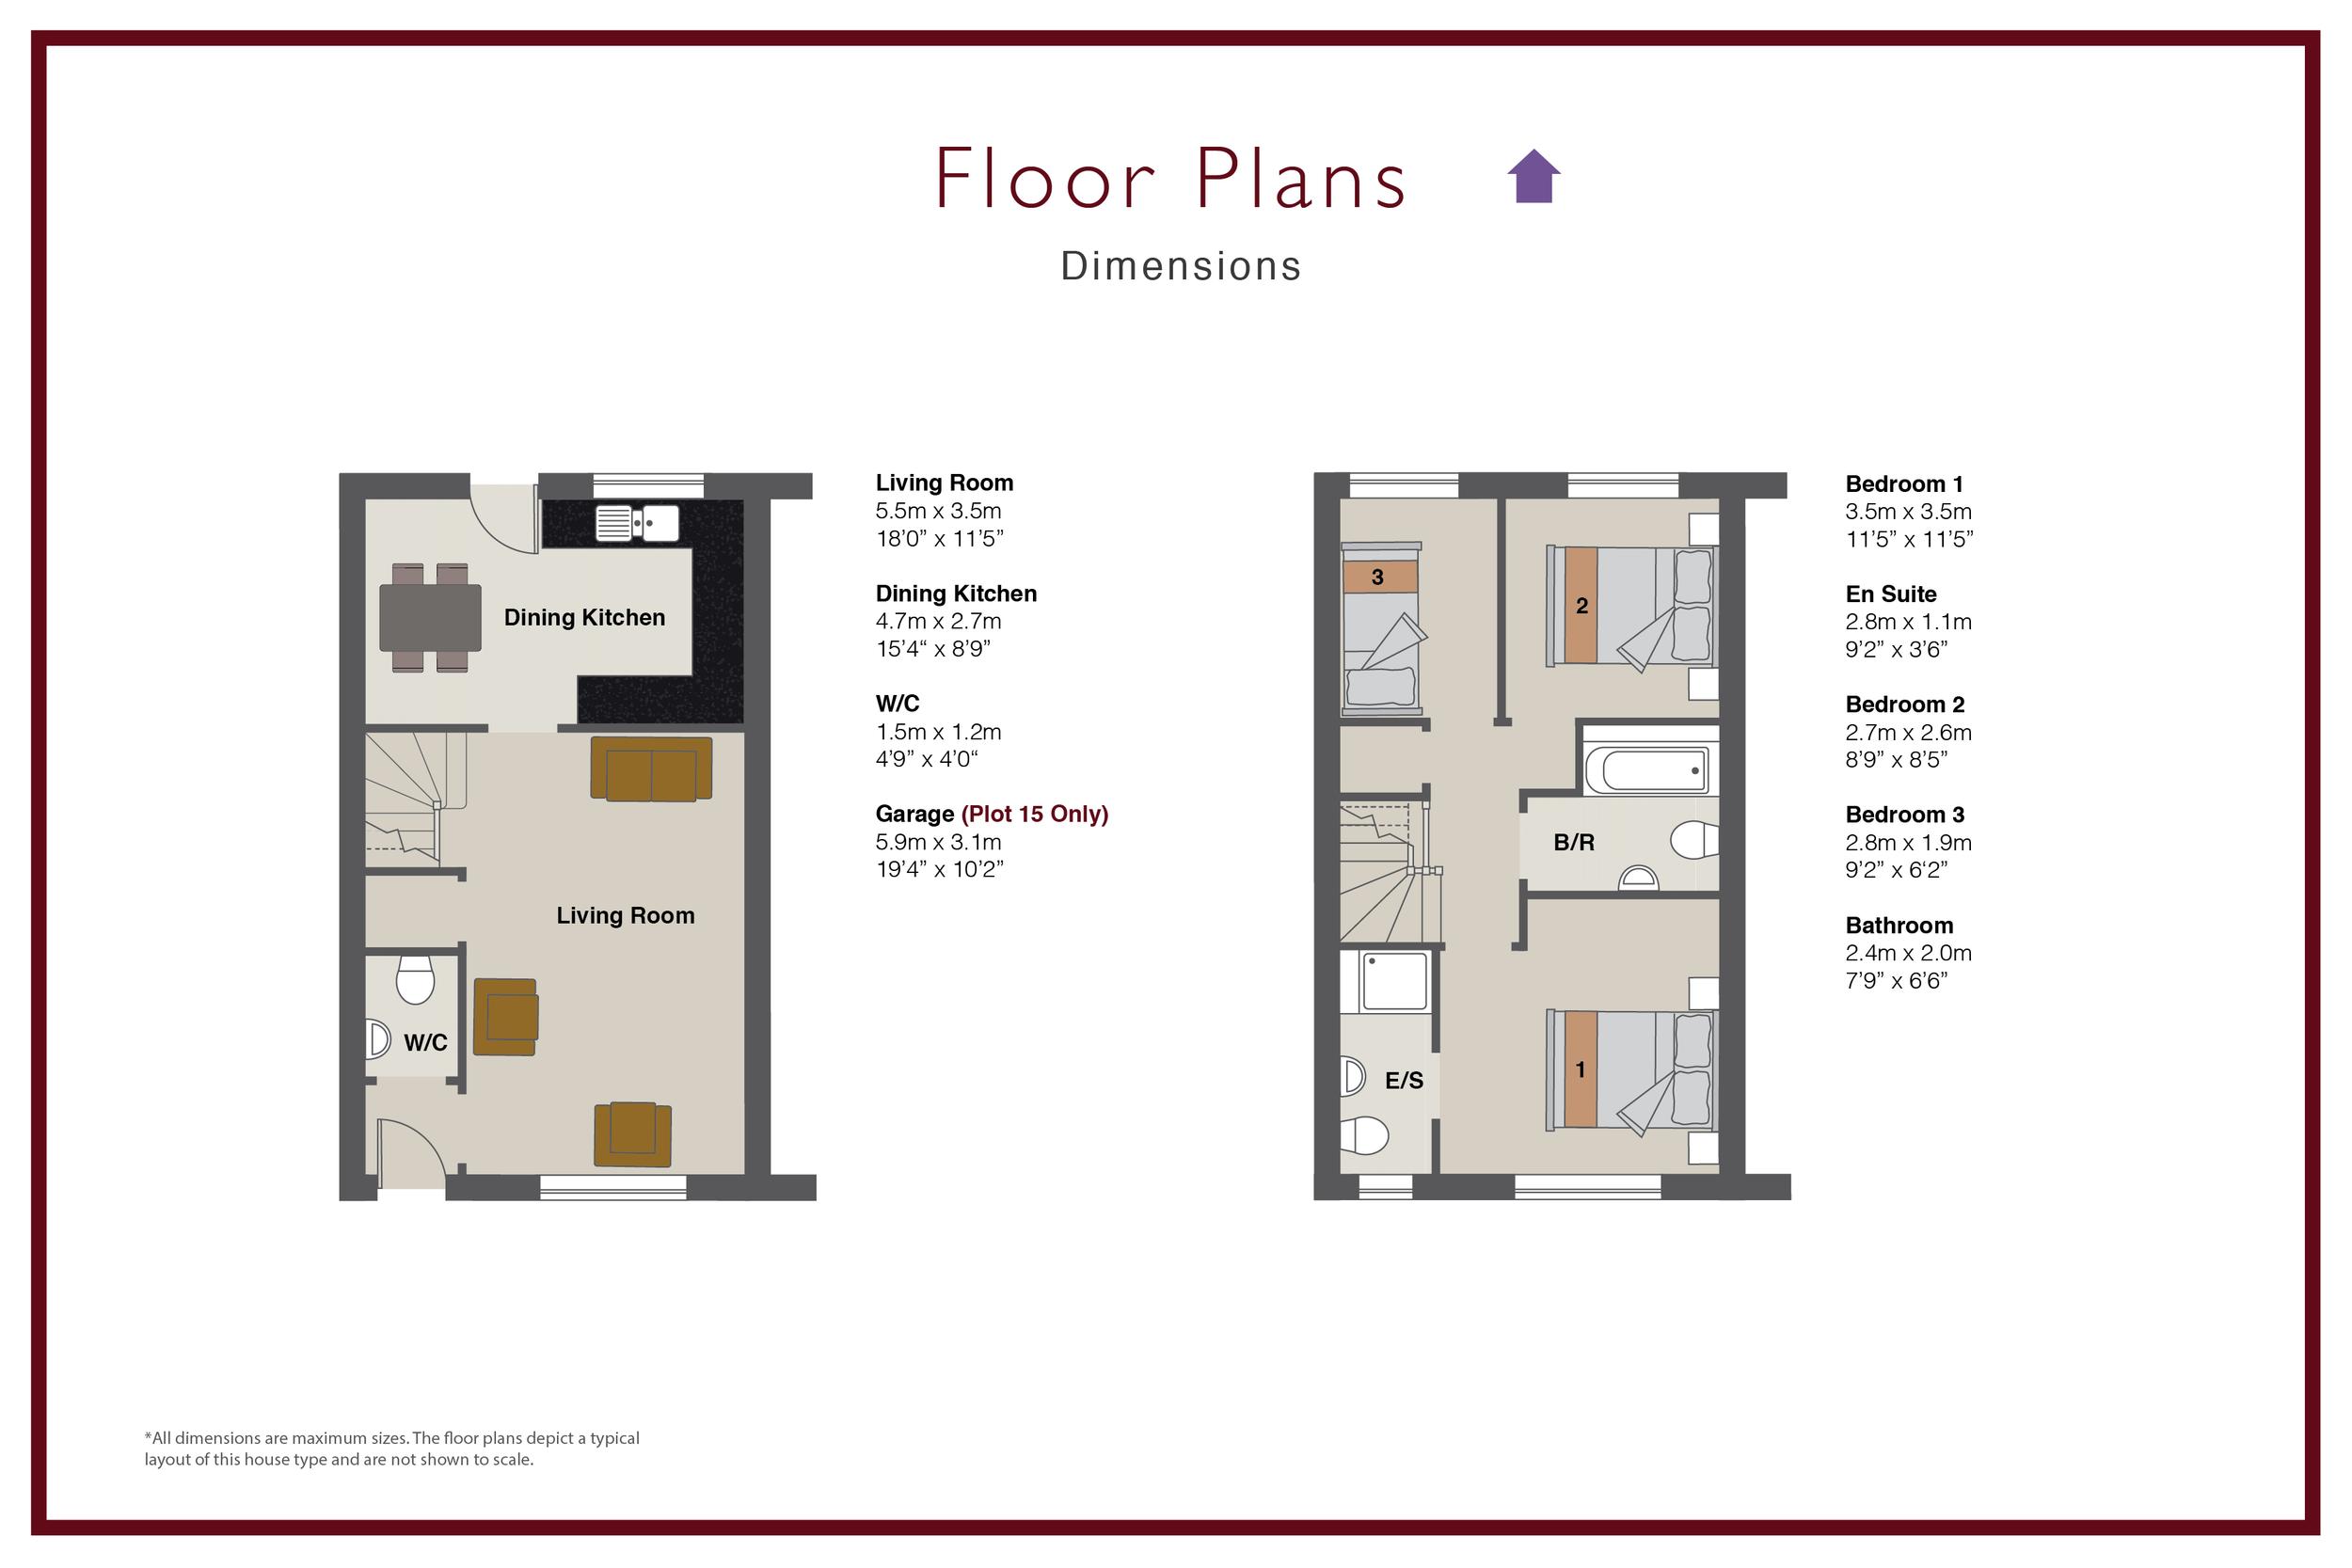 Floorplans_3x2 The Loddington.png